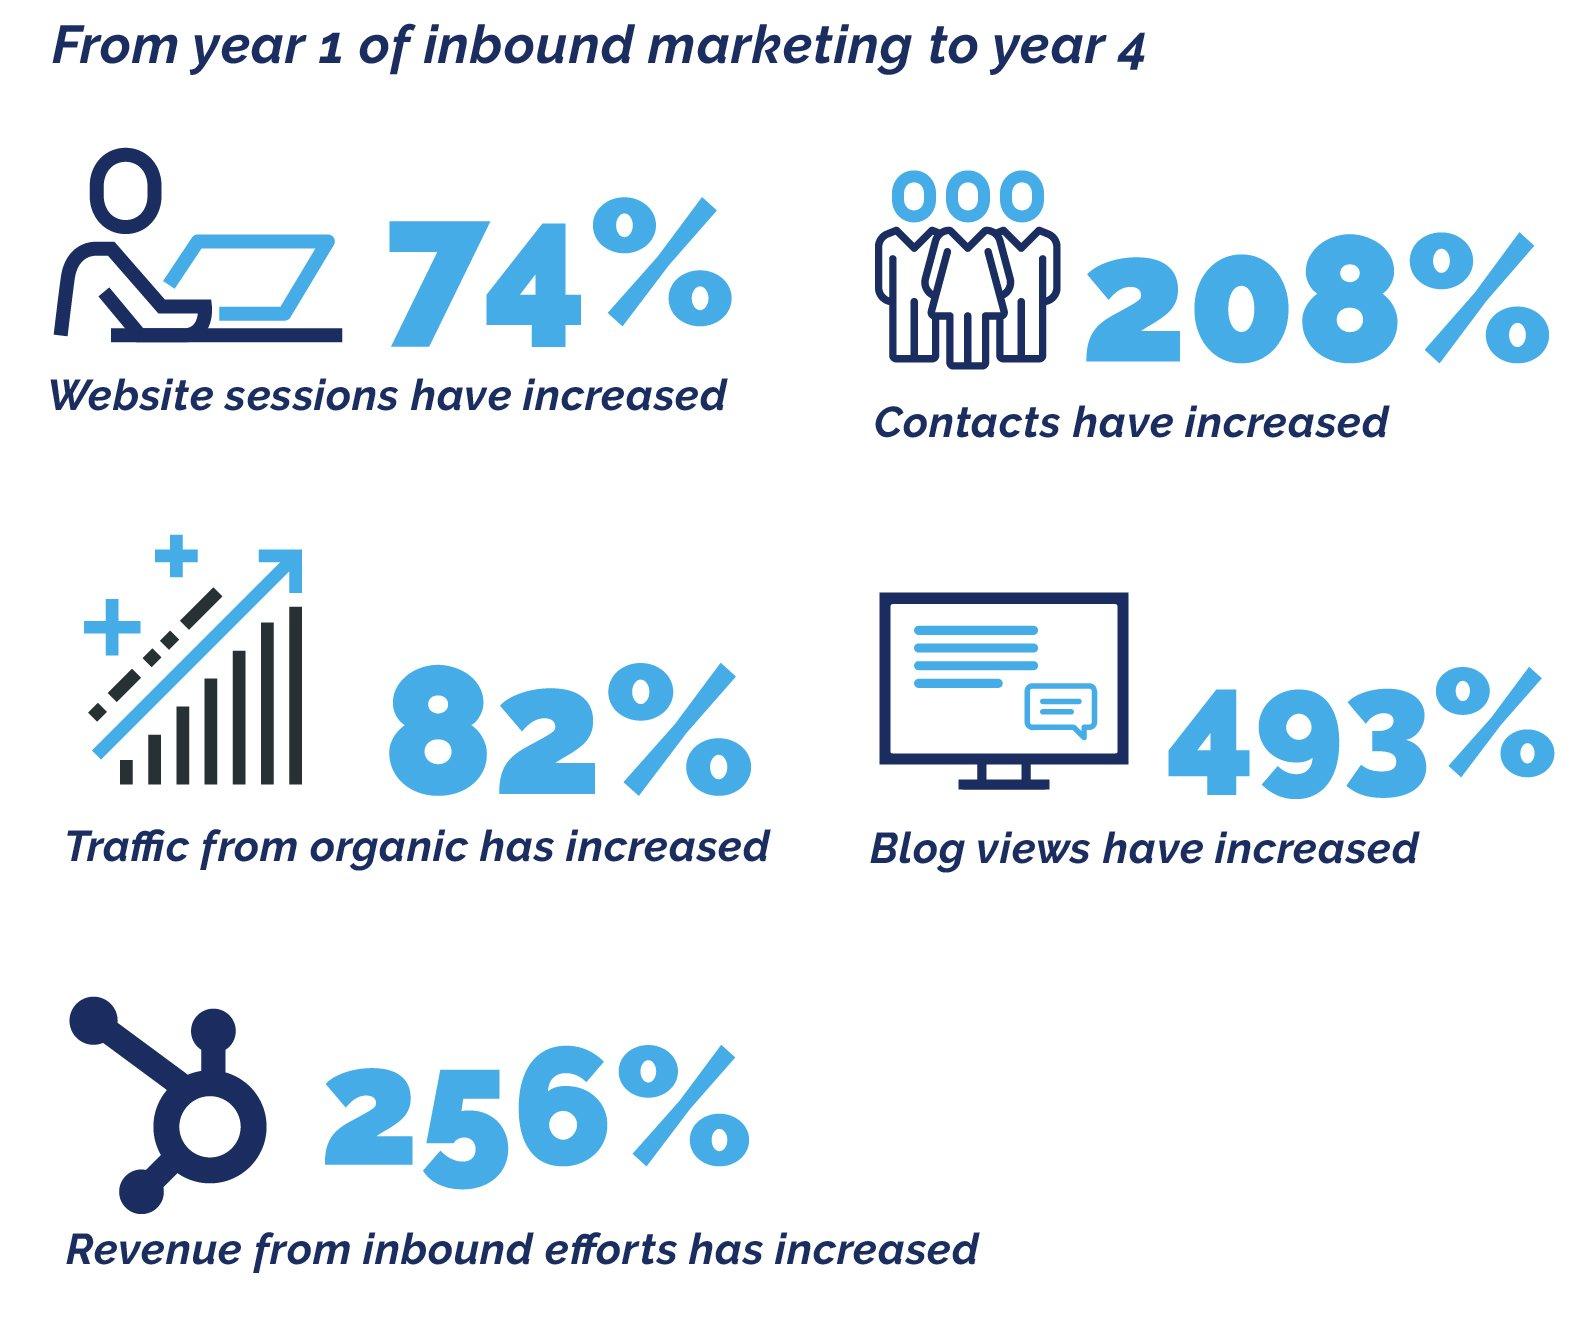 Year 1 to Year 4  of Inbound Marketing Metrics